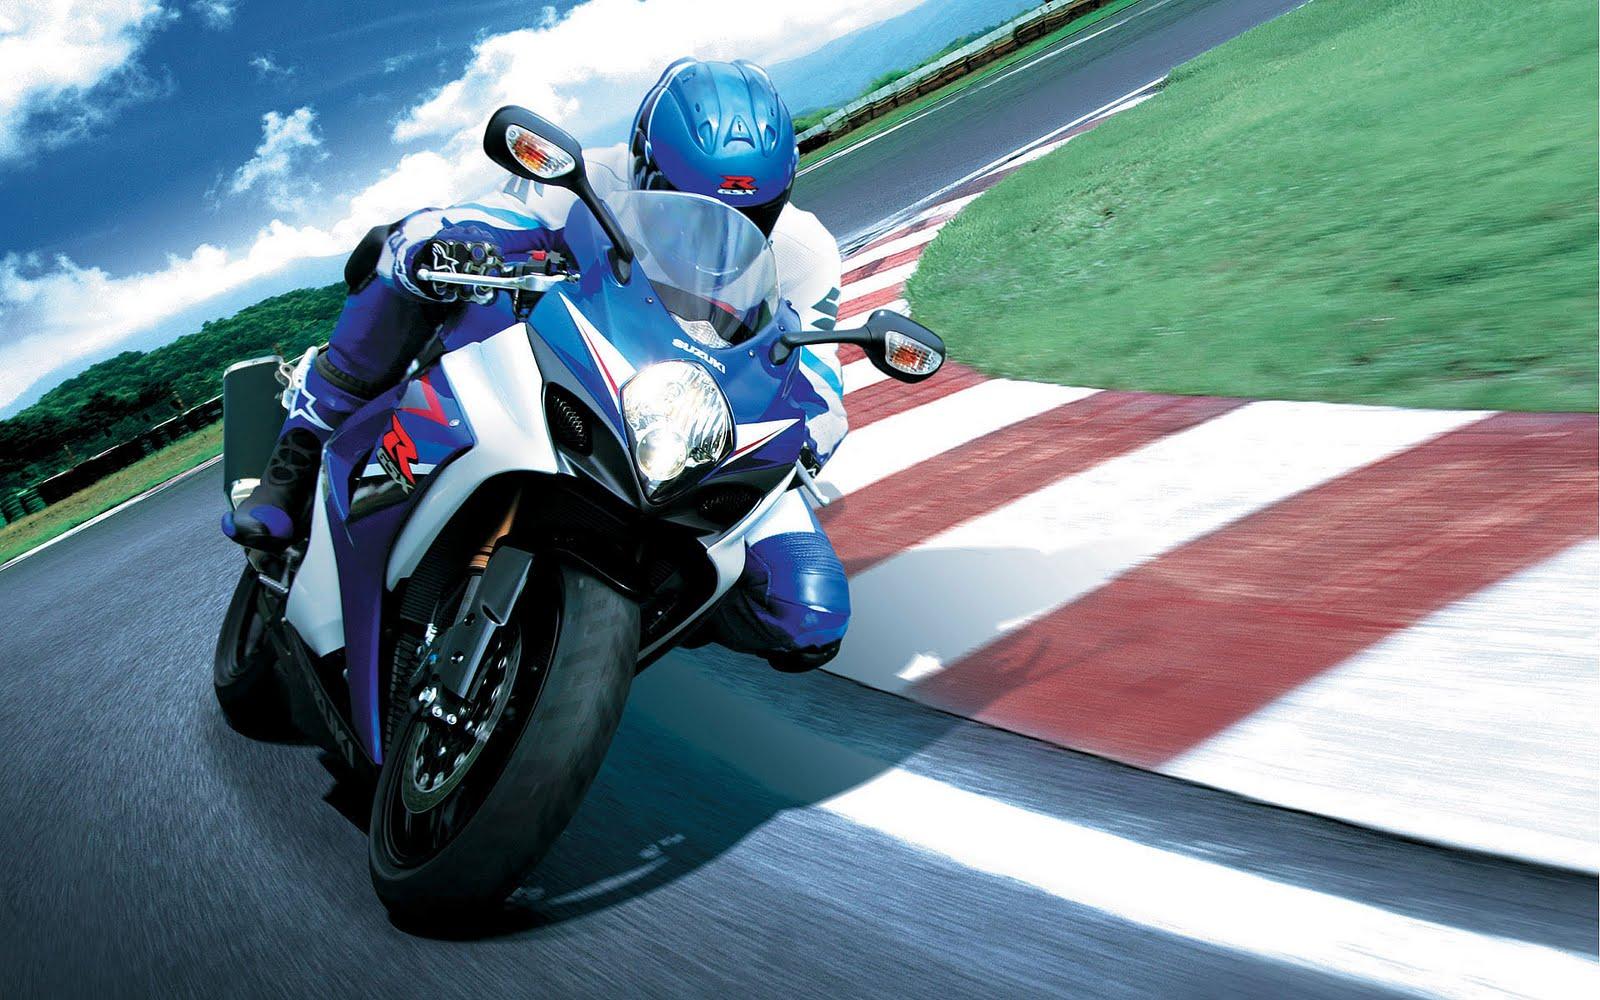 Motorcycle Racing Wallpapers On Wallpaperdog